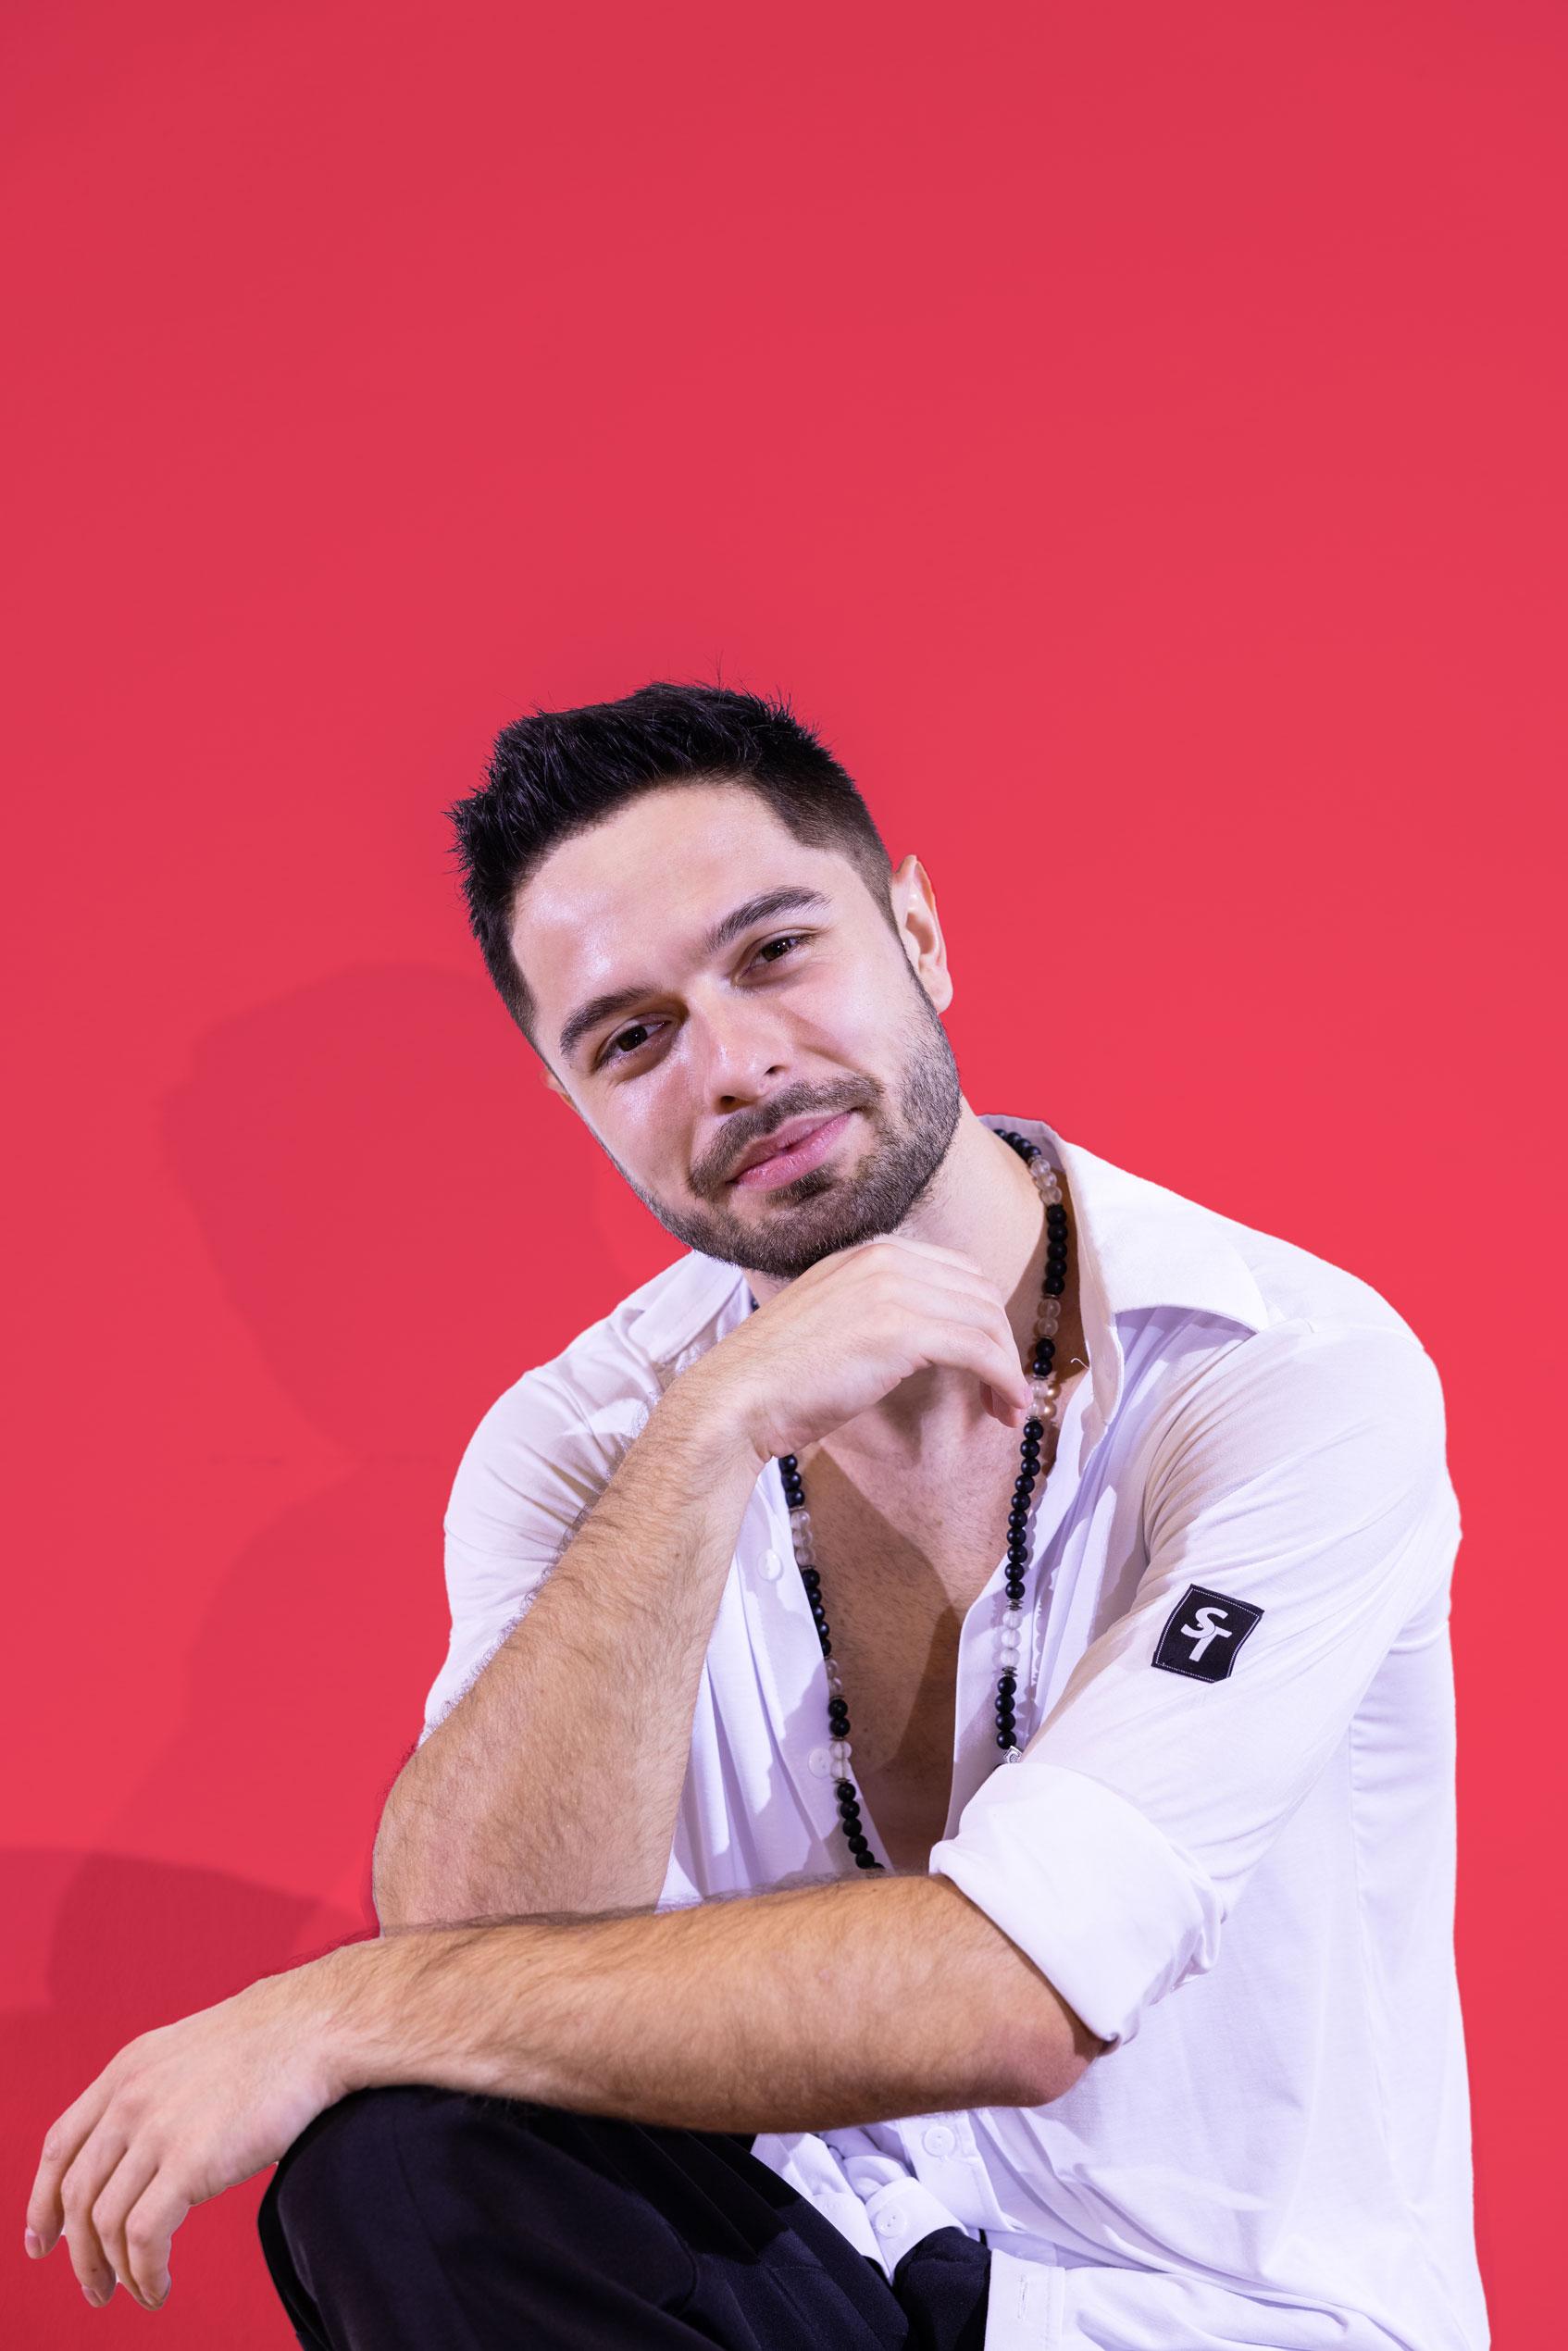 dance instructor profile picture Pavel Hurov